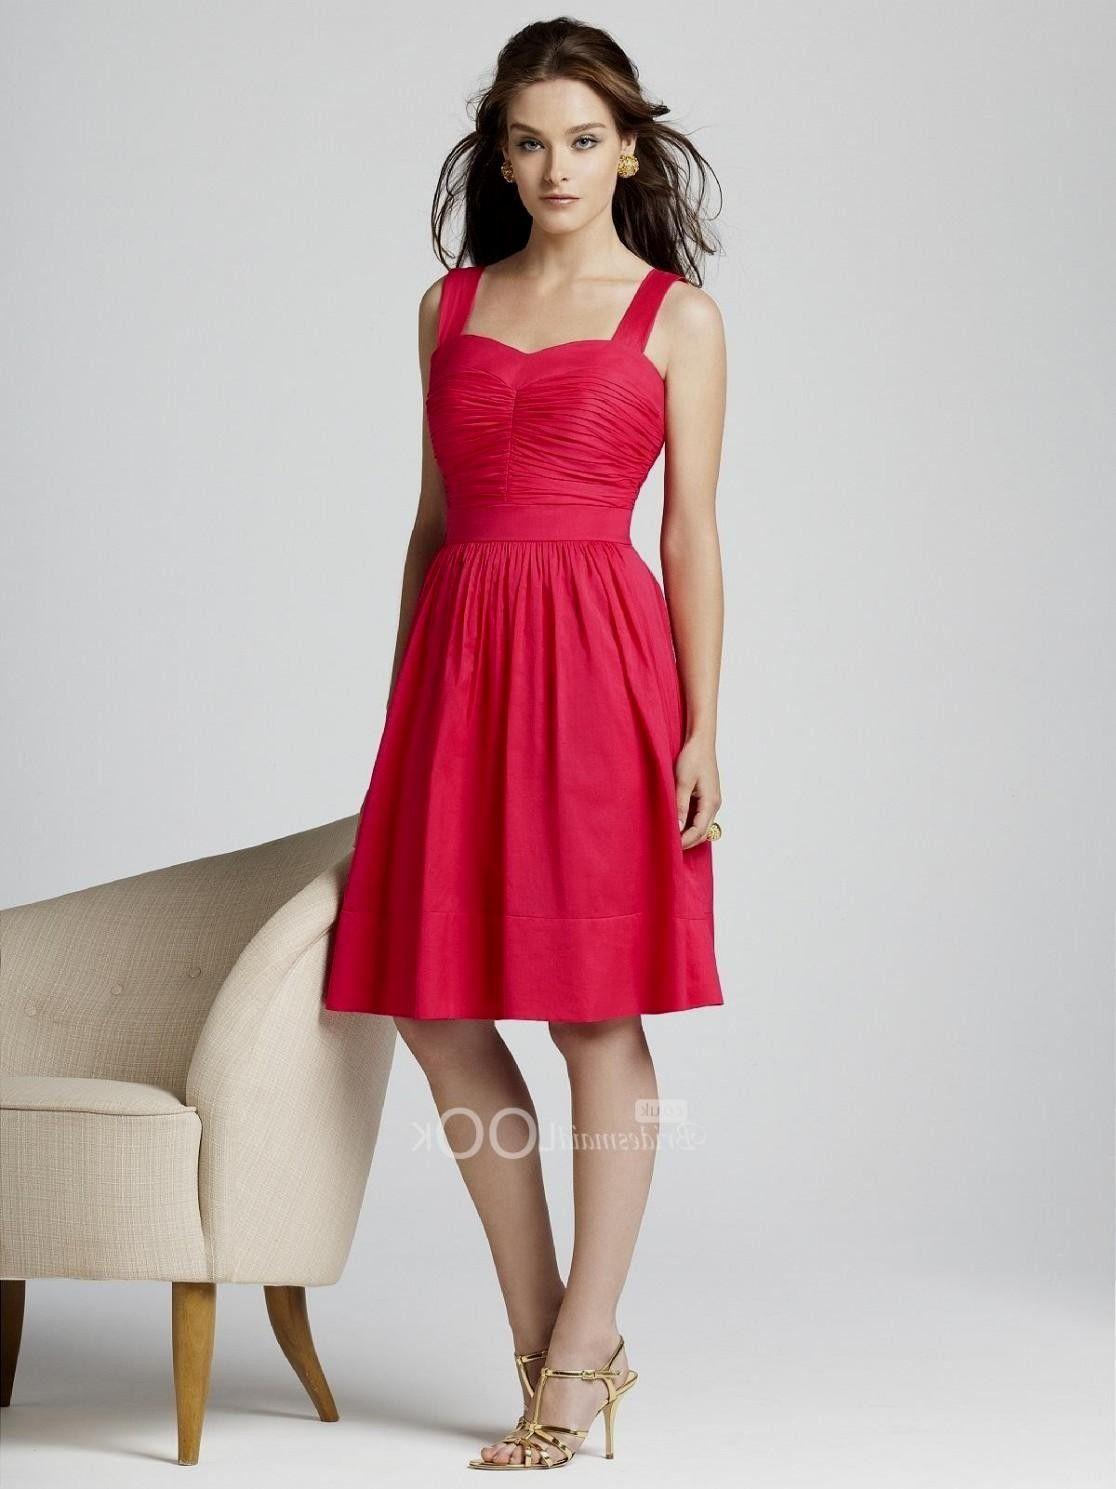 Hot pink bridesmaid dresses pink bridesmaid dresses pinterest hot pink bridesmaid dresses ombrellifo Image collections